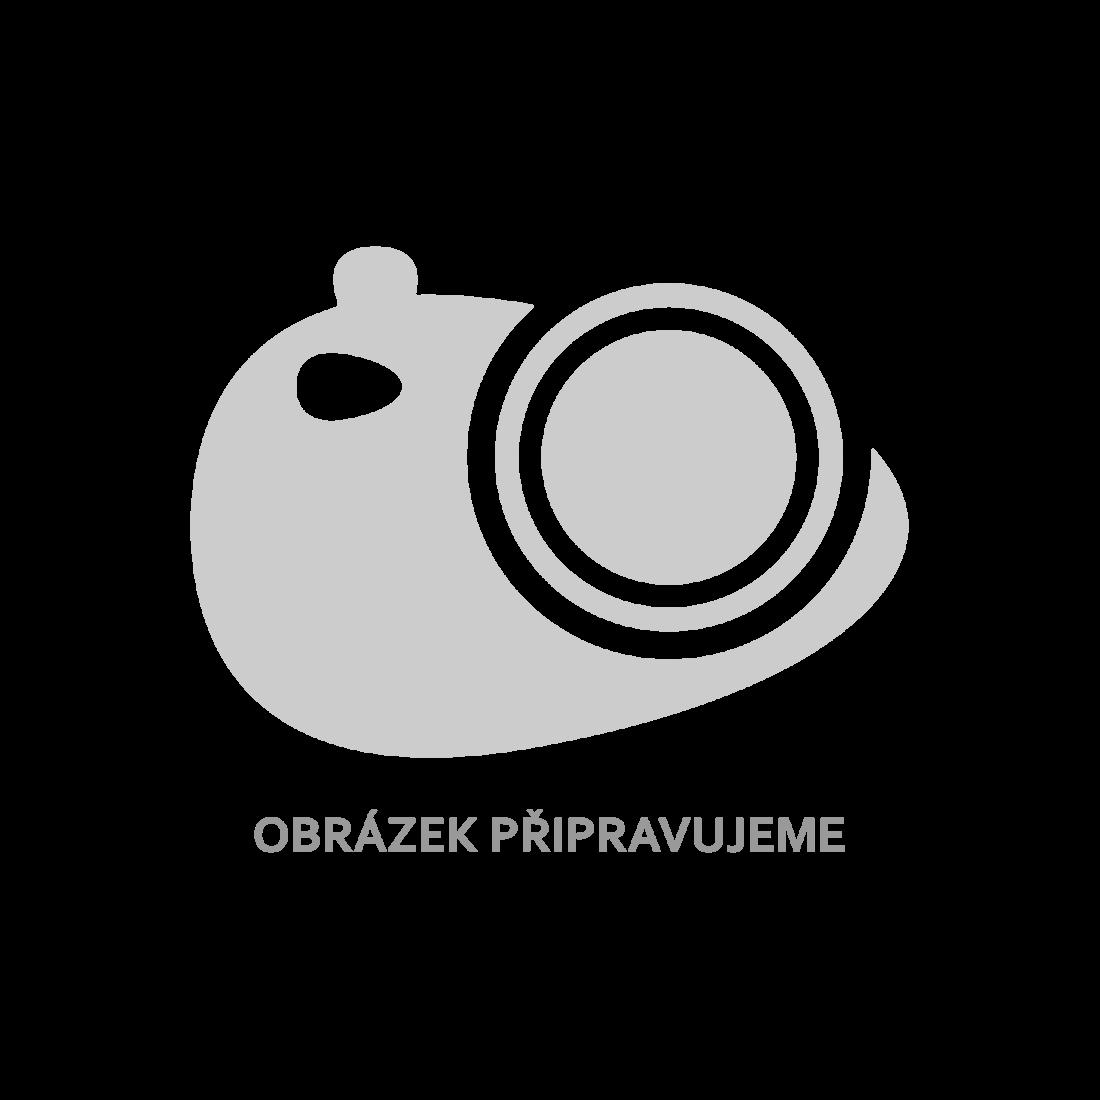 vidaXL Knihovna dub sonoma 98 x 30 x 98 cm dřevotříska [801128]